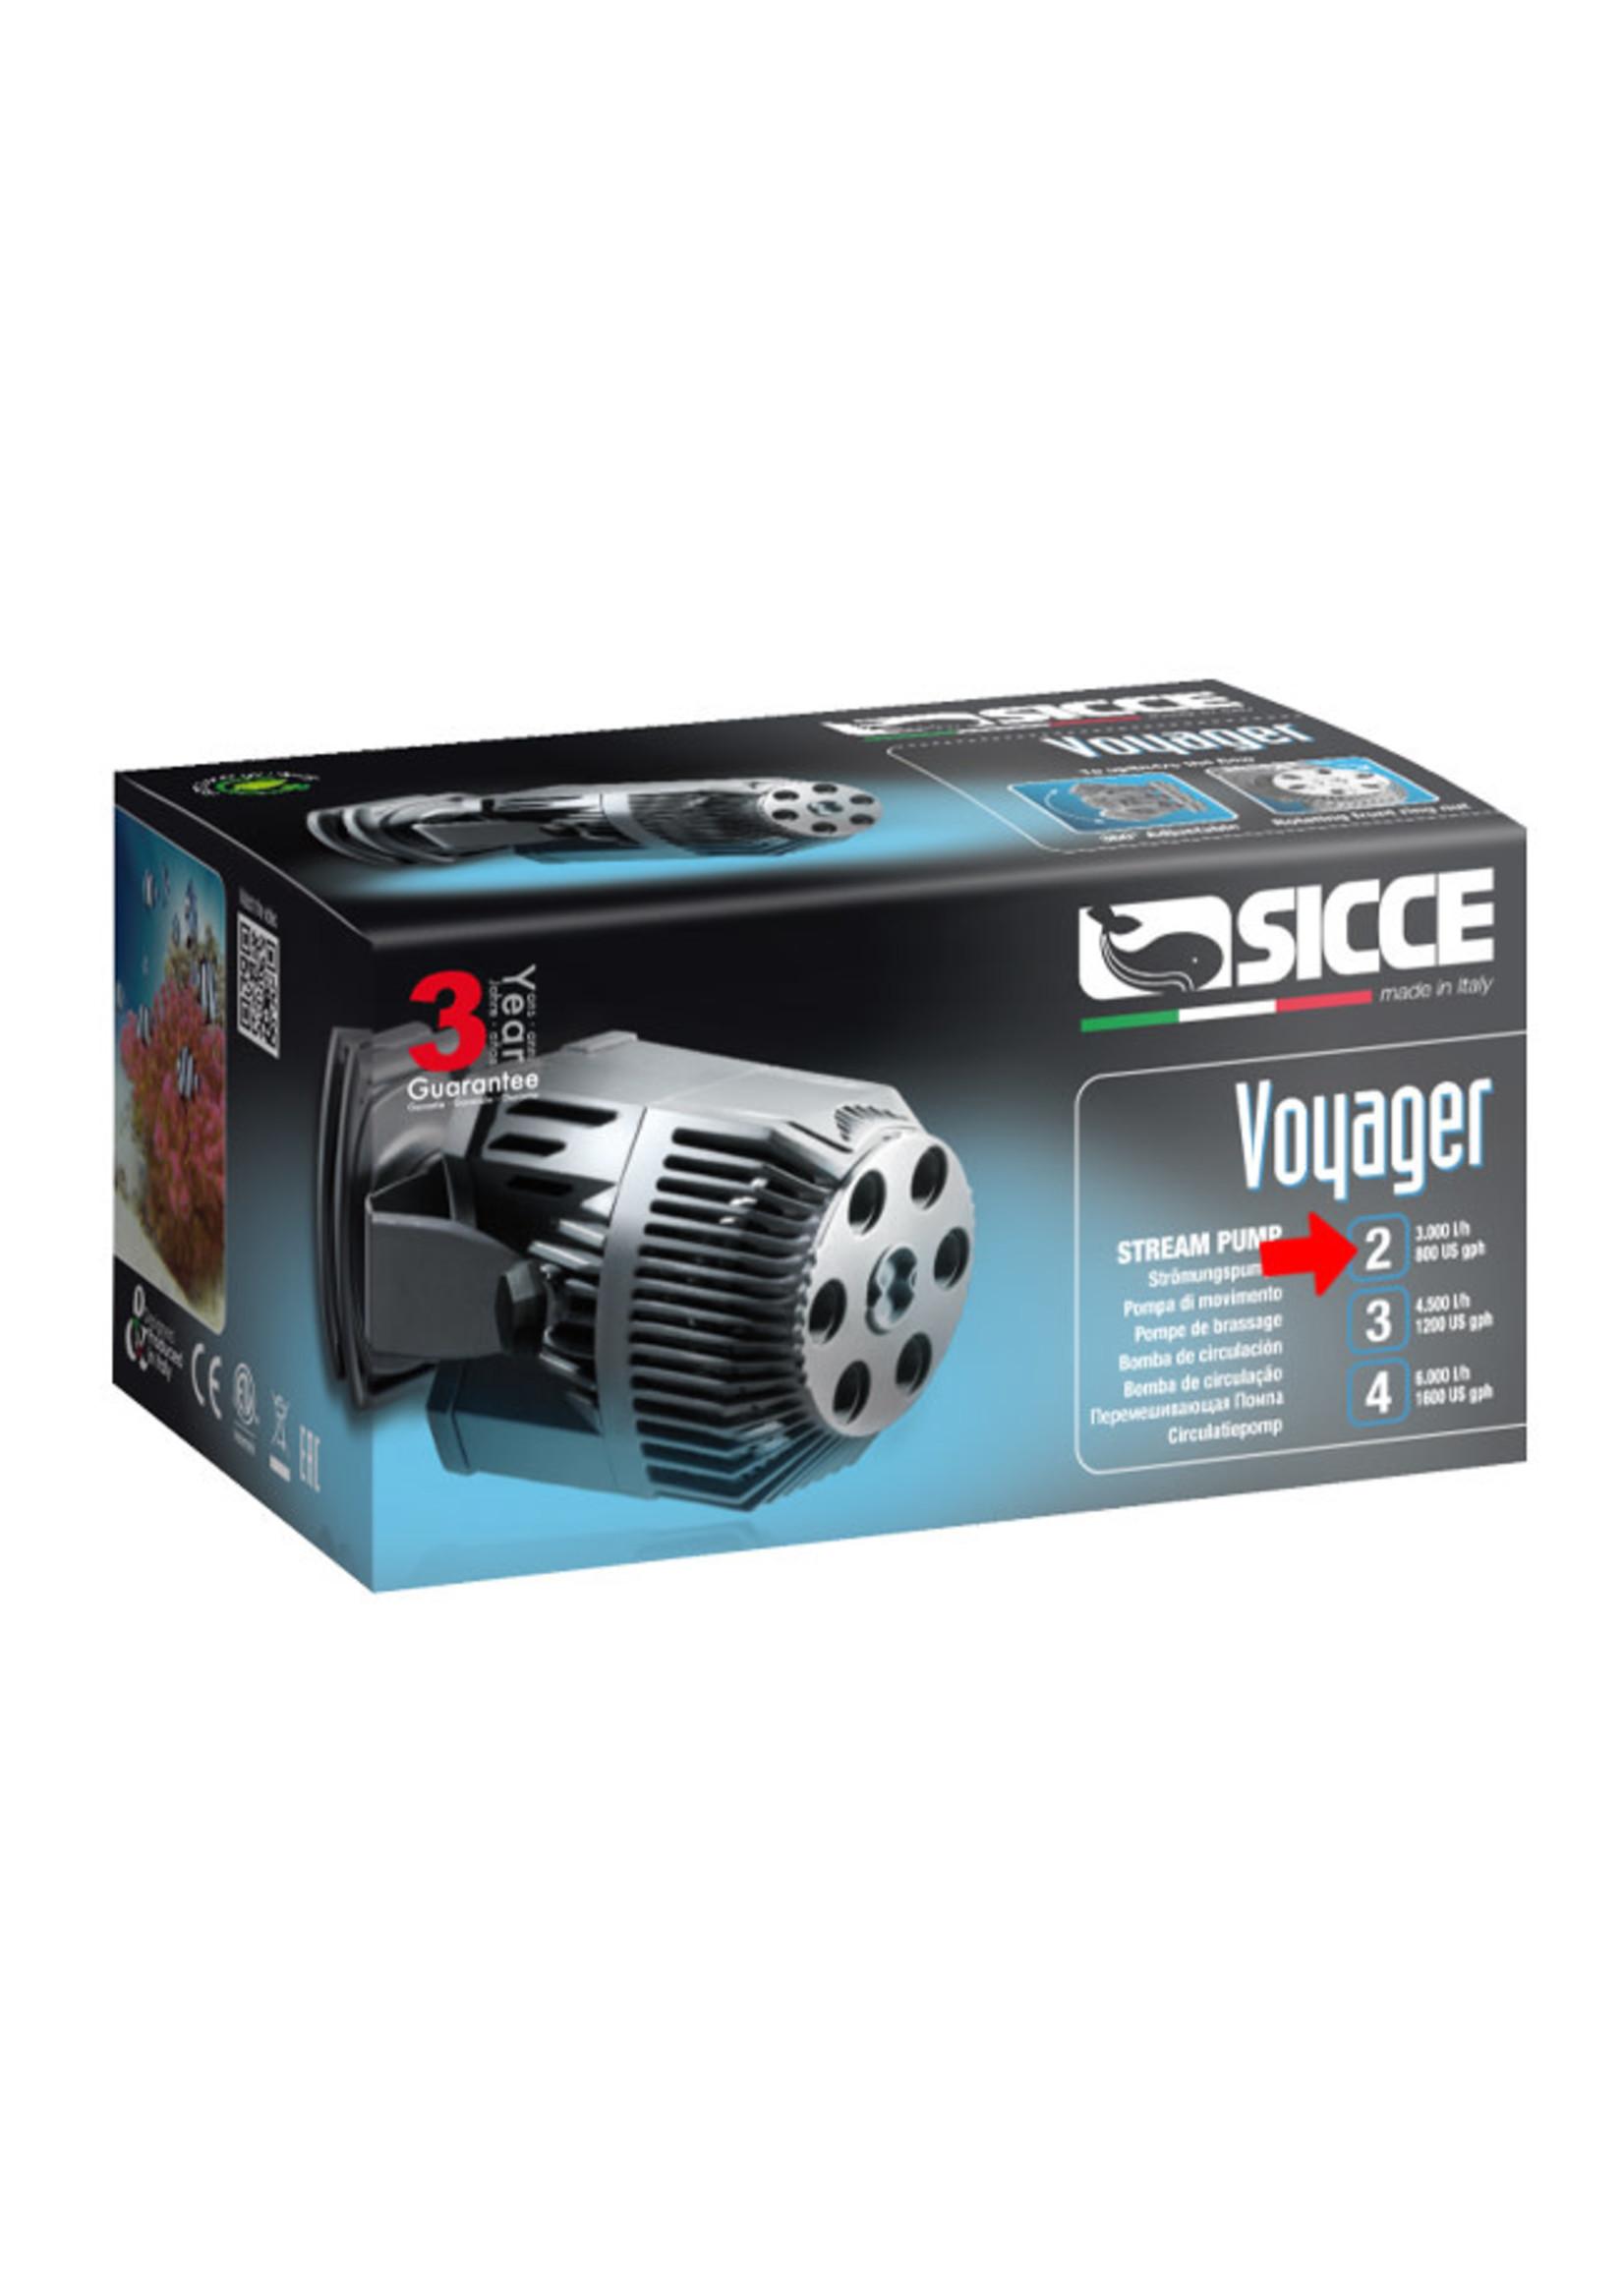 SICCE US, Inc. Sicce Voyager Stream Pump 2, 800gph